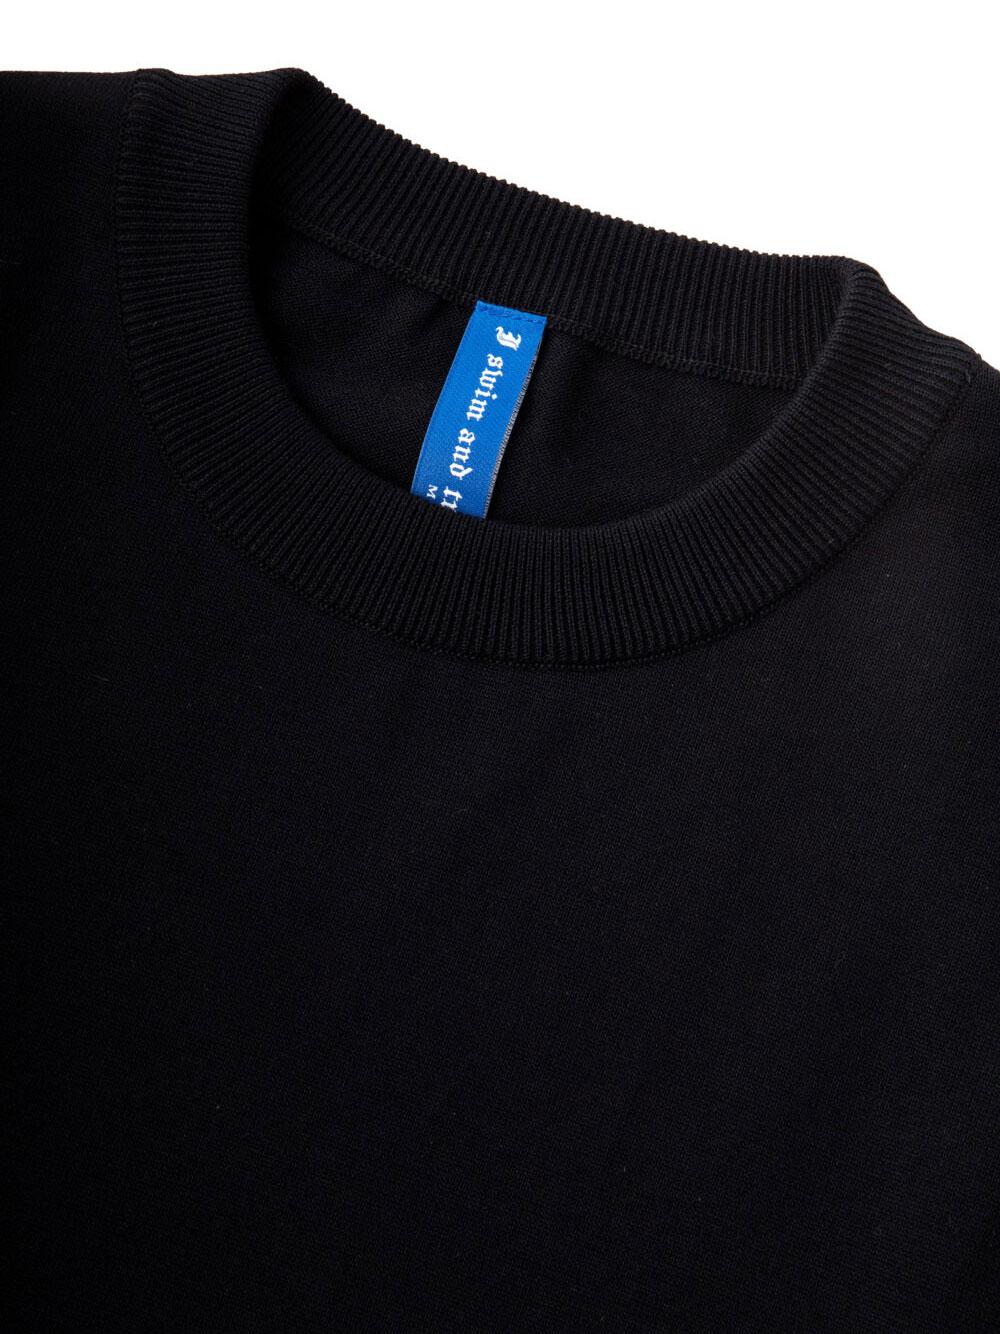 Water Repellent Premium Tee Shirt 002-Black